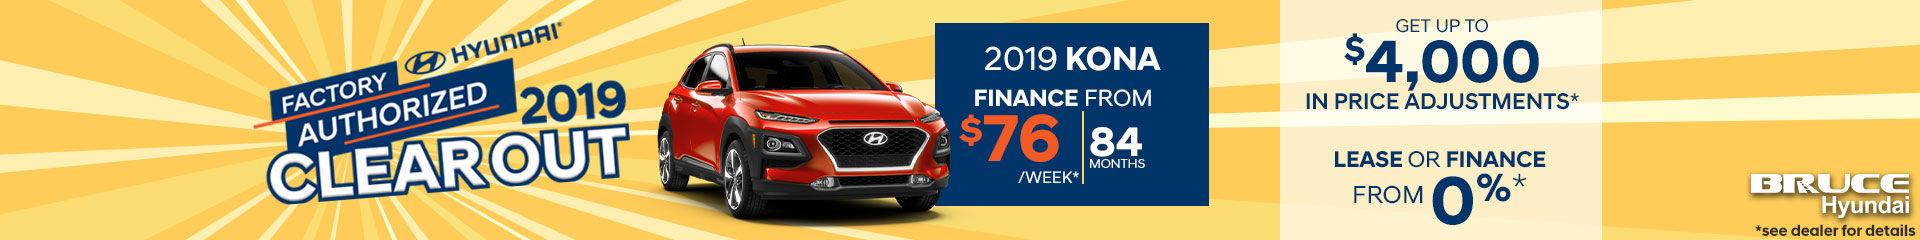 Finance the 2019 Hyundai Kona